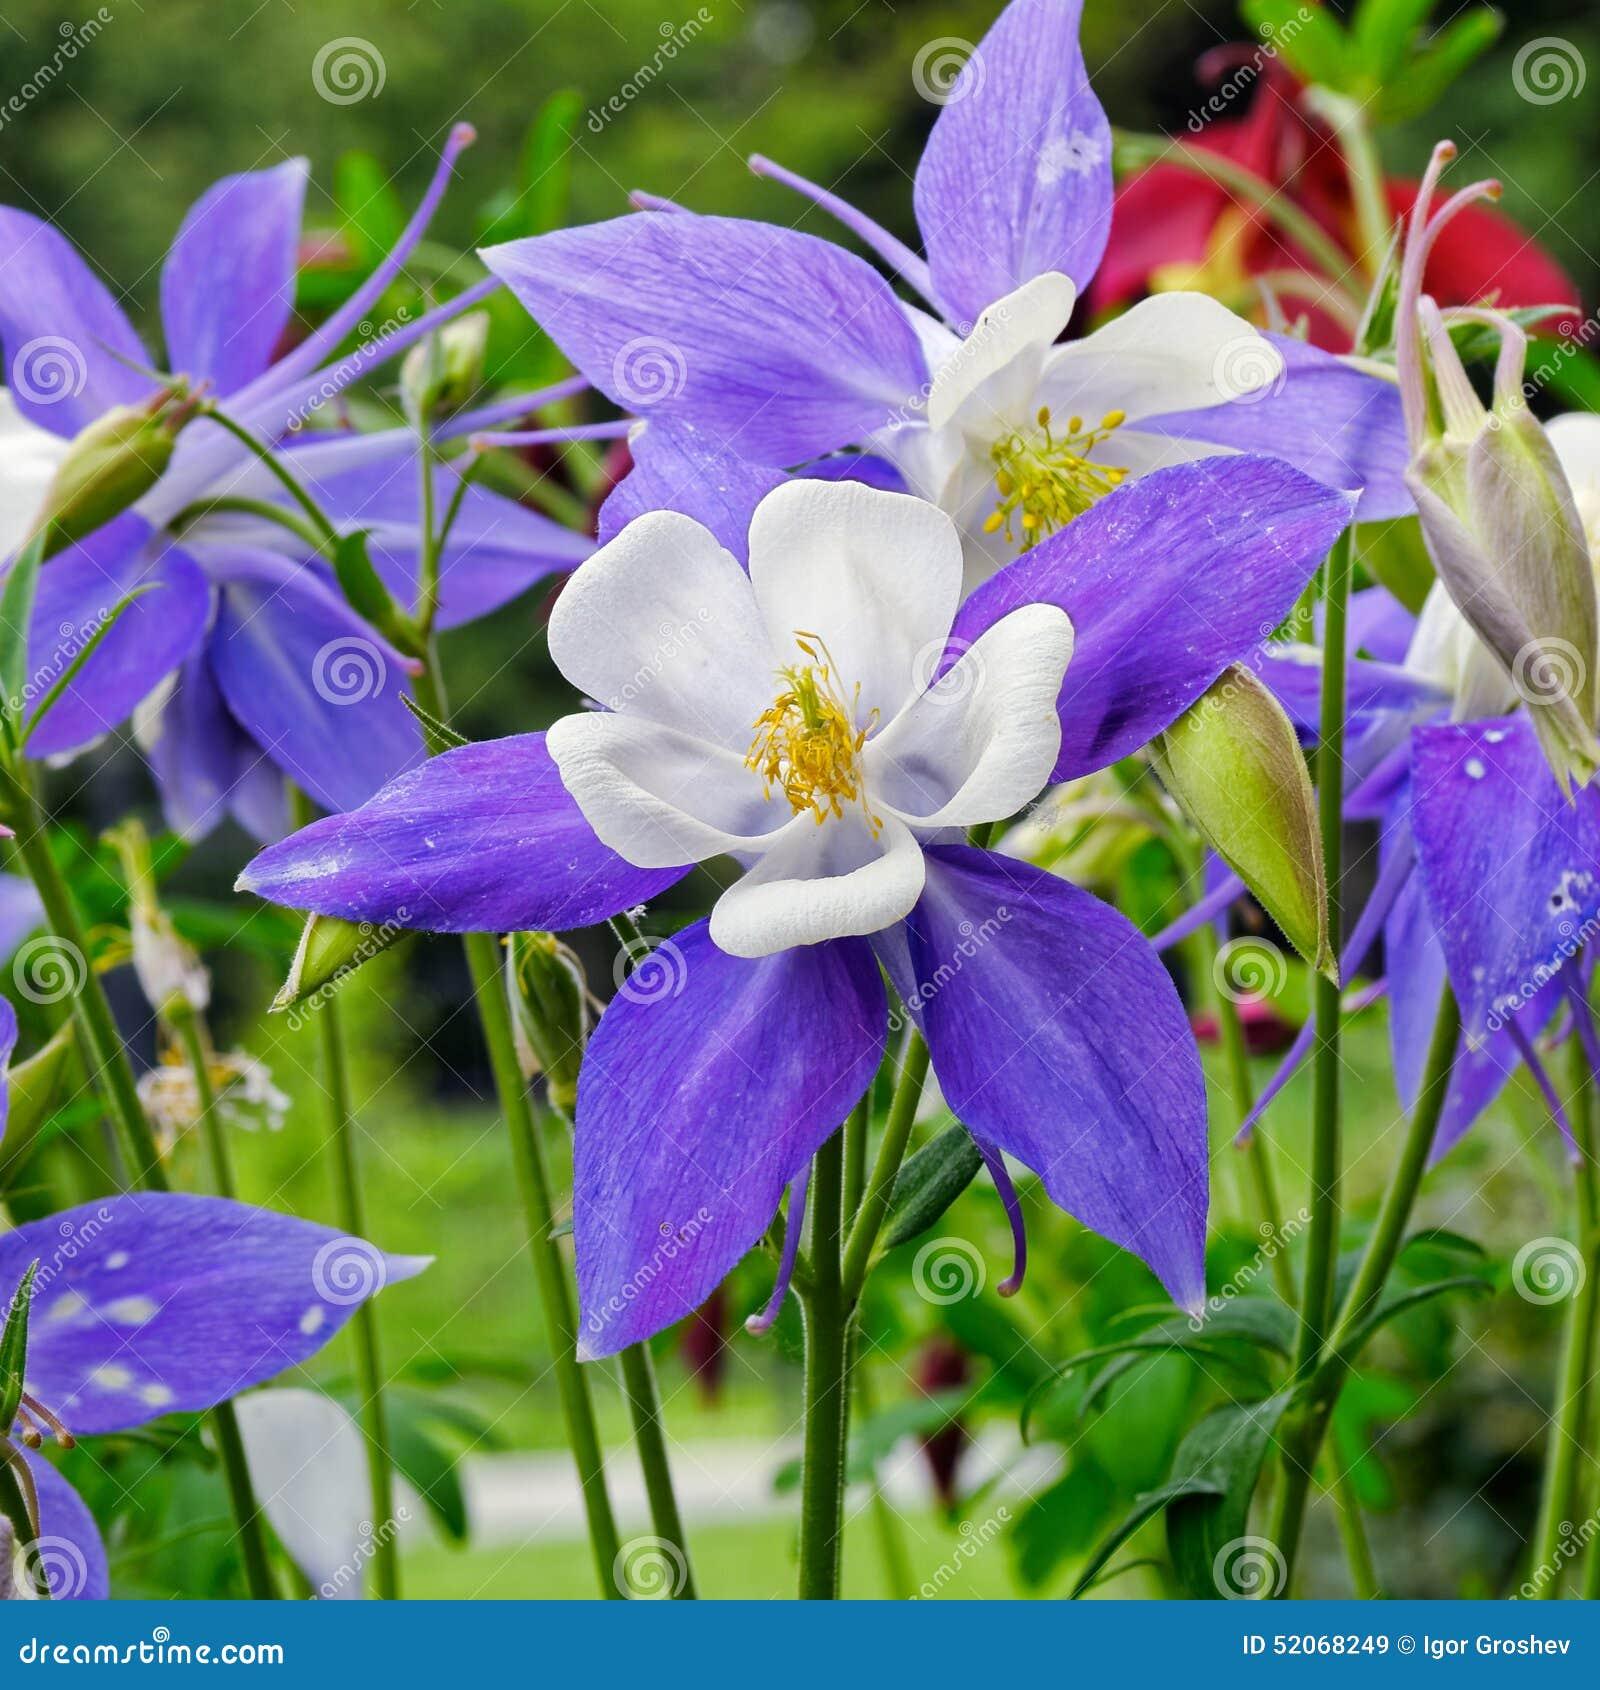 Columbine Flower Stock Image Image Of Plant Pink Stem 52068249